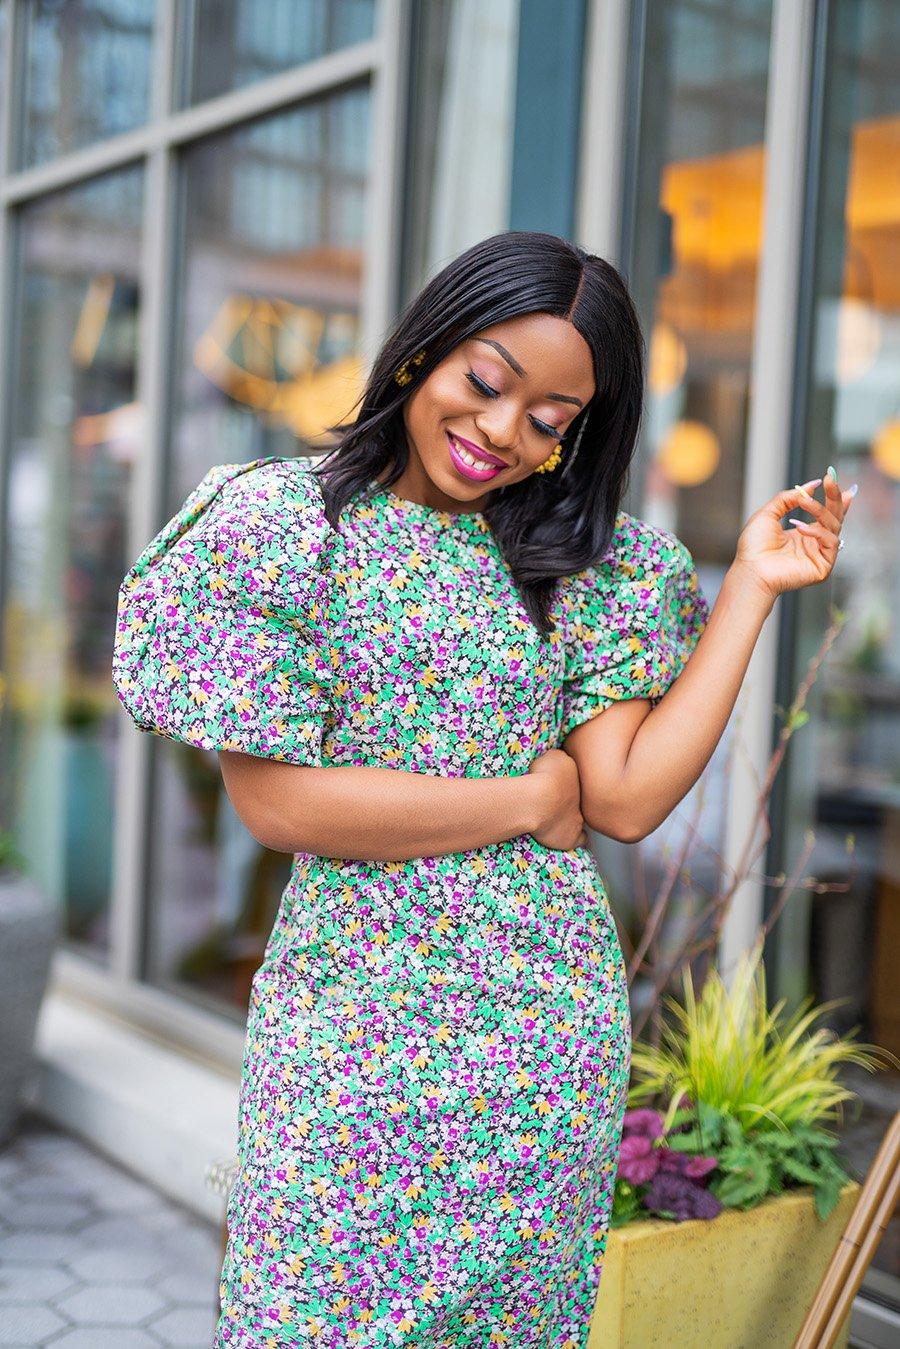 stella-adewunmi-of-jadore-fashion-blog-share-spring-puffy-sleeve-dress